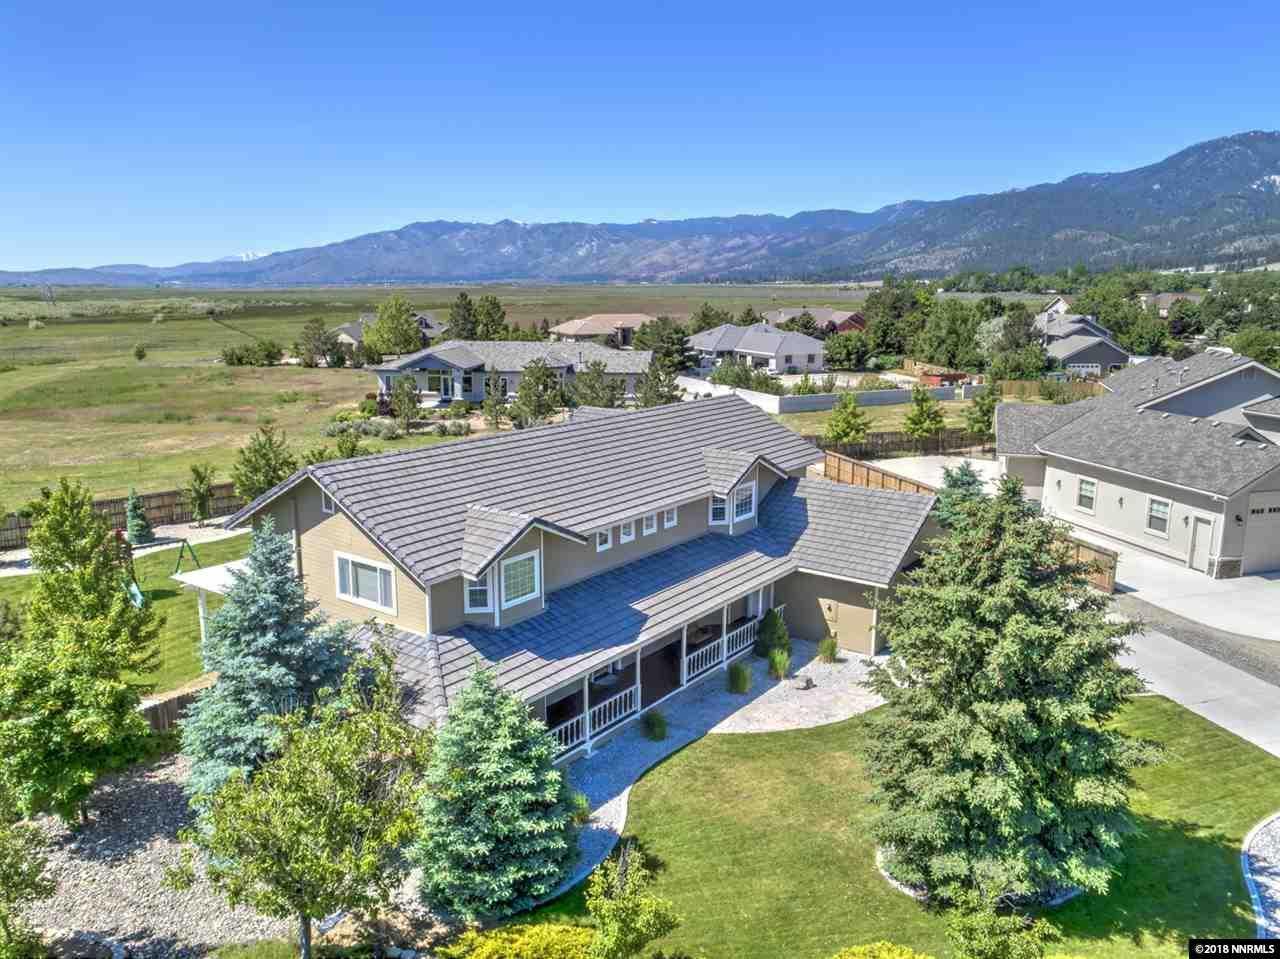 325 Sanctuary Washoe Valley, NV 89704-8500 | MLS 180008246 Photo 1